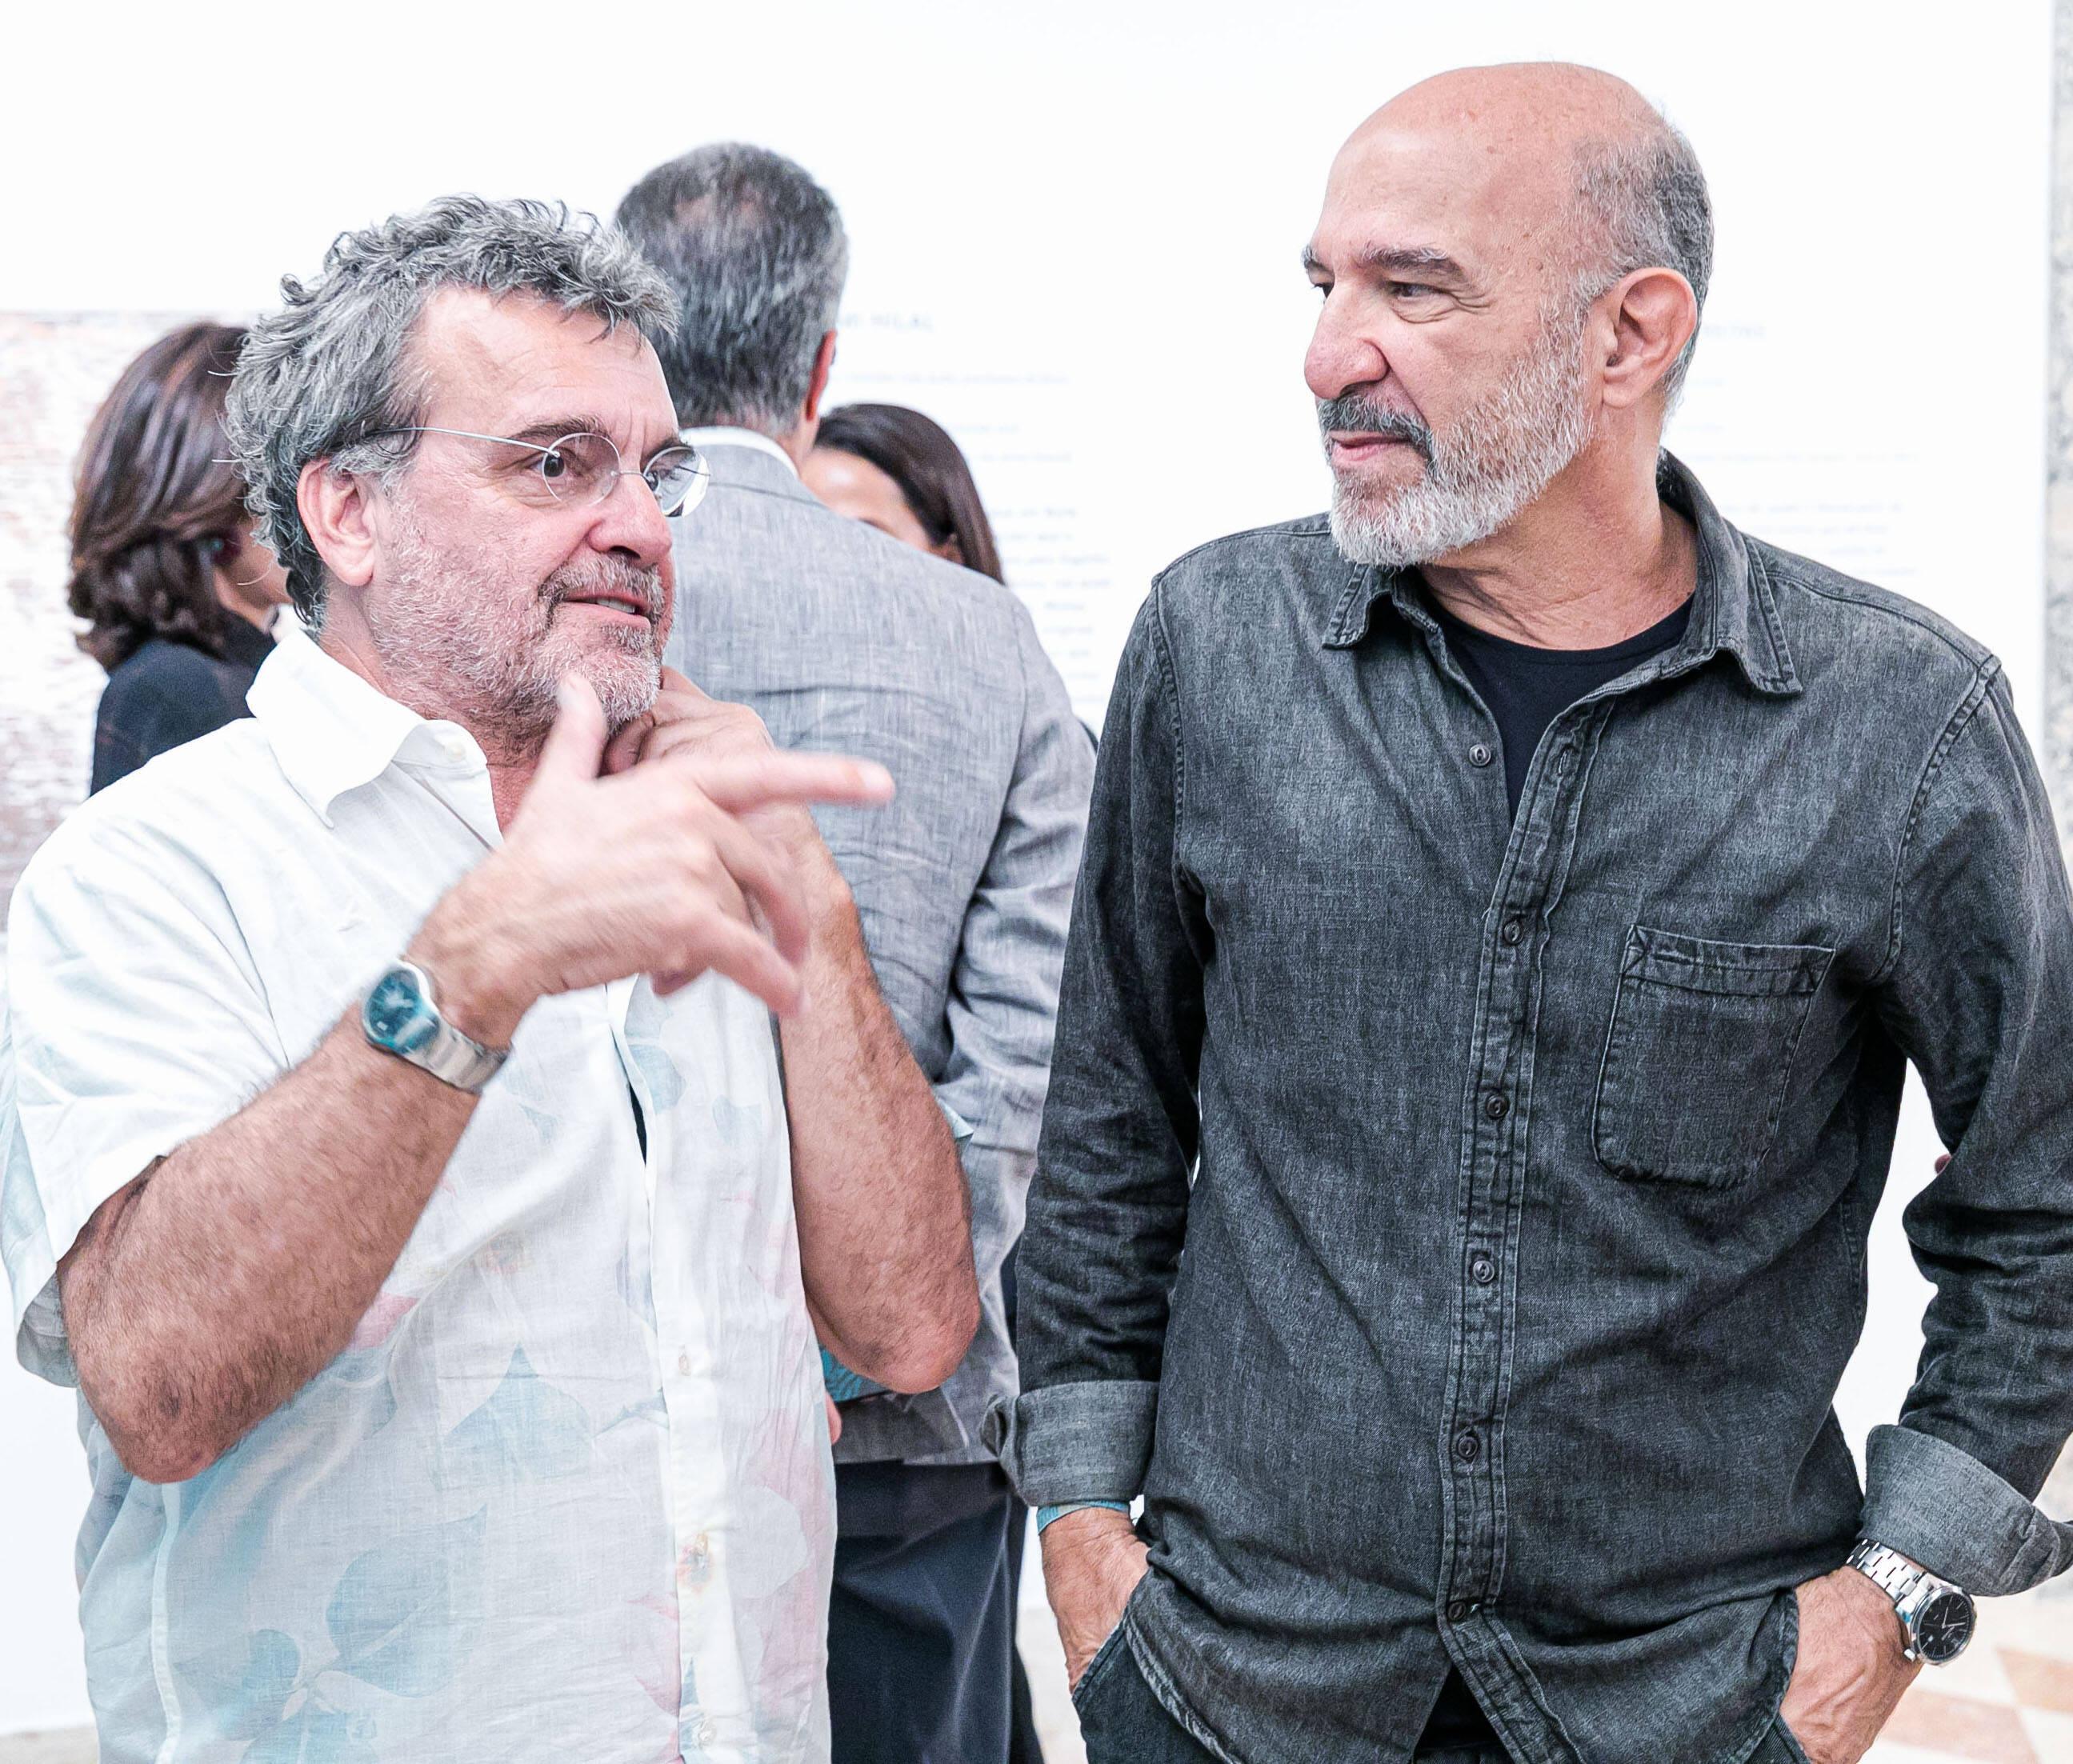 Antonio Mendel e Hilal Sami Hilal / Foto: Miguel Sá